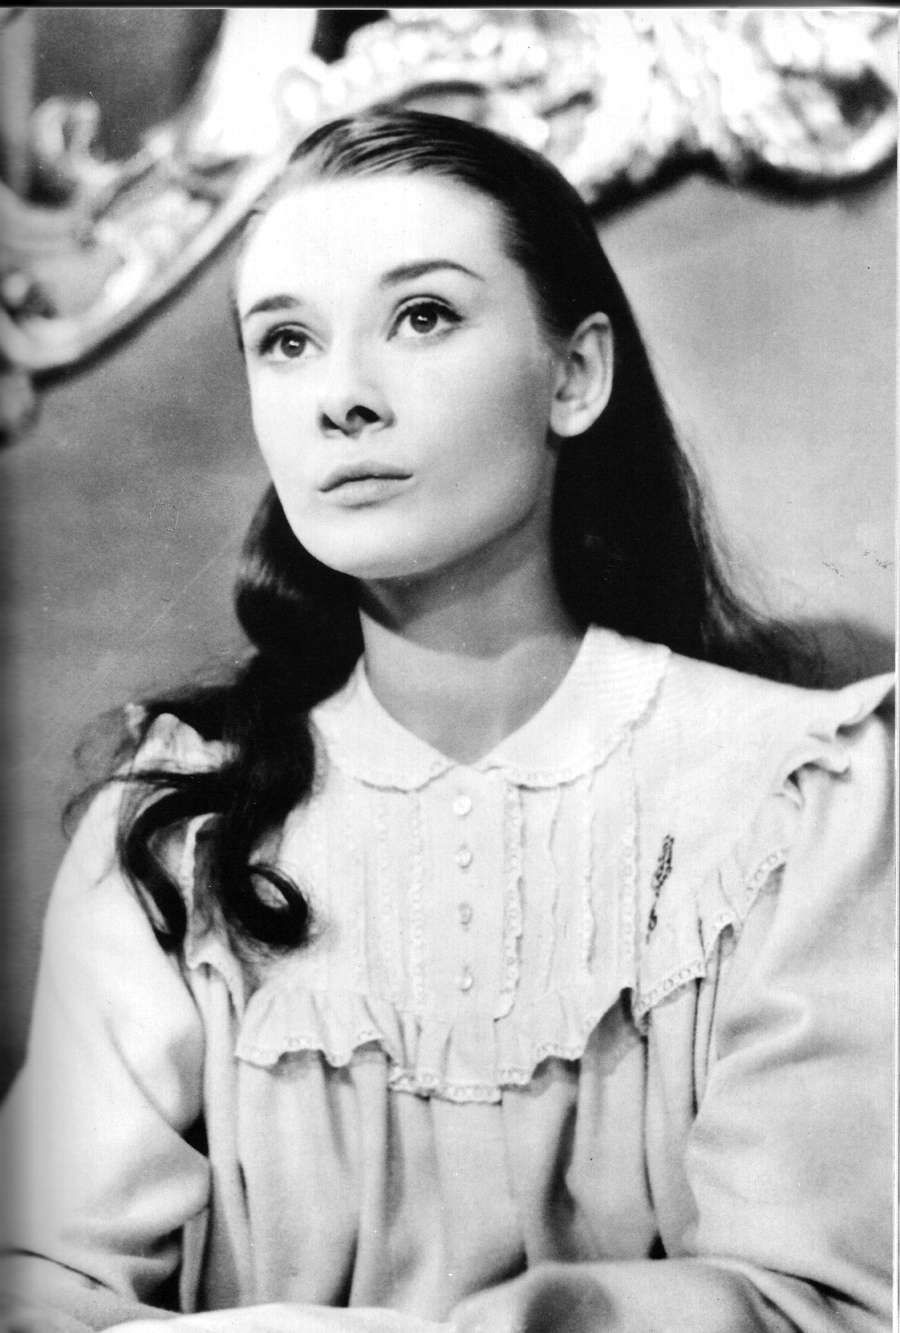 30 Pictures Of Young Audrey Hepburn Audrey Hepburn Roman Holiday Young Audrey Hepburn Audrey Hepburn